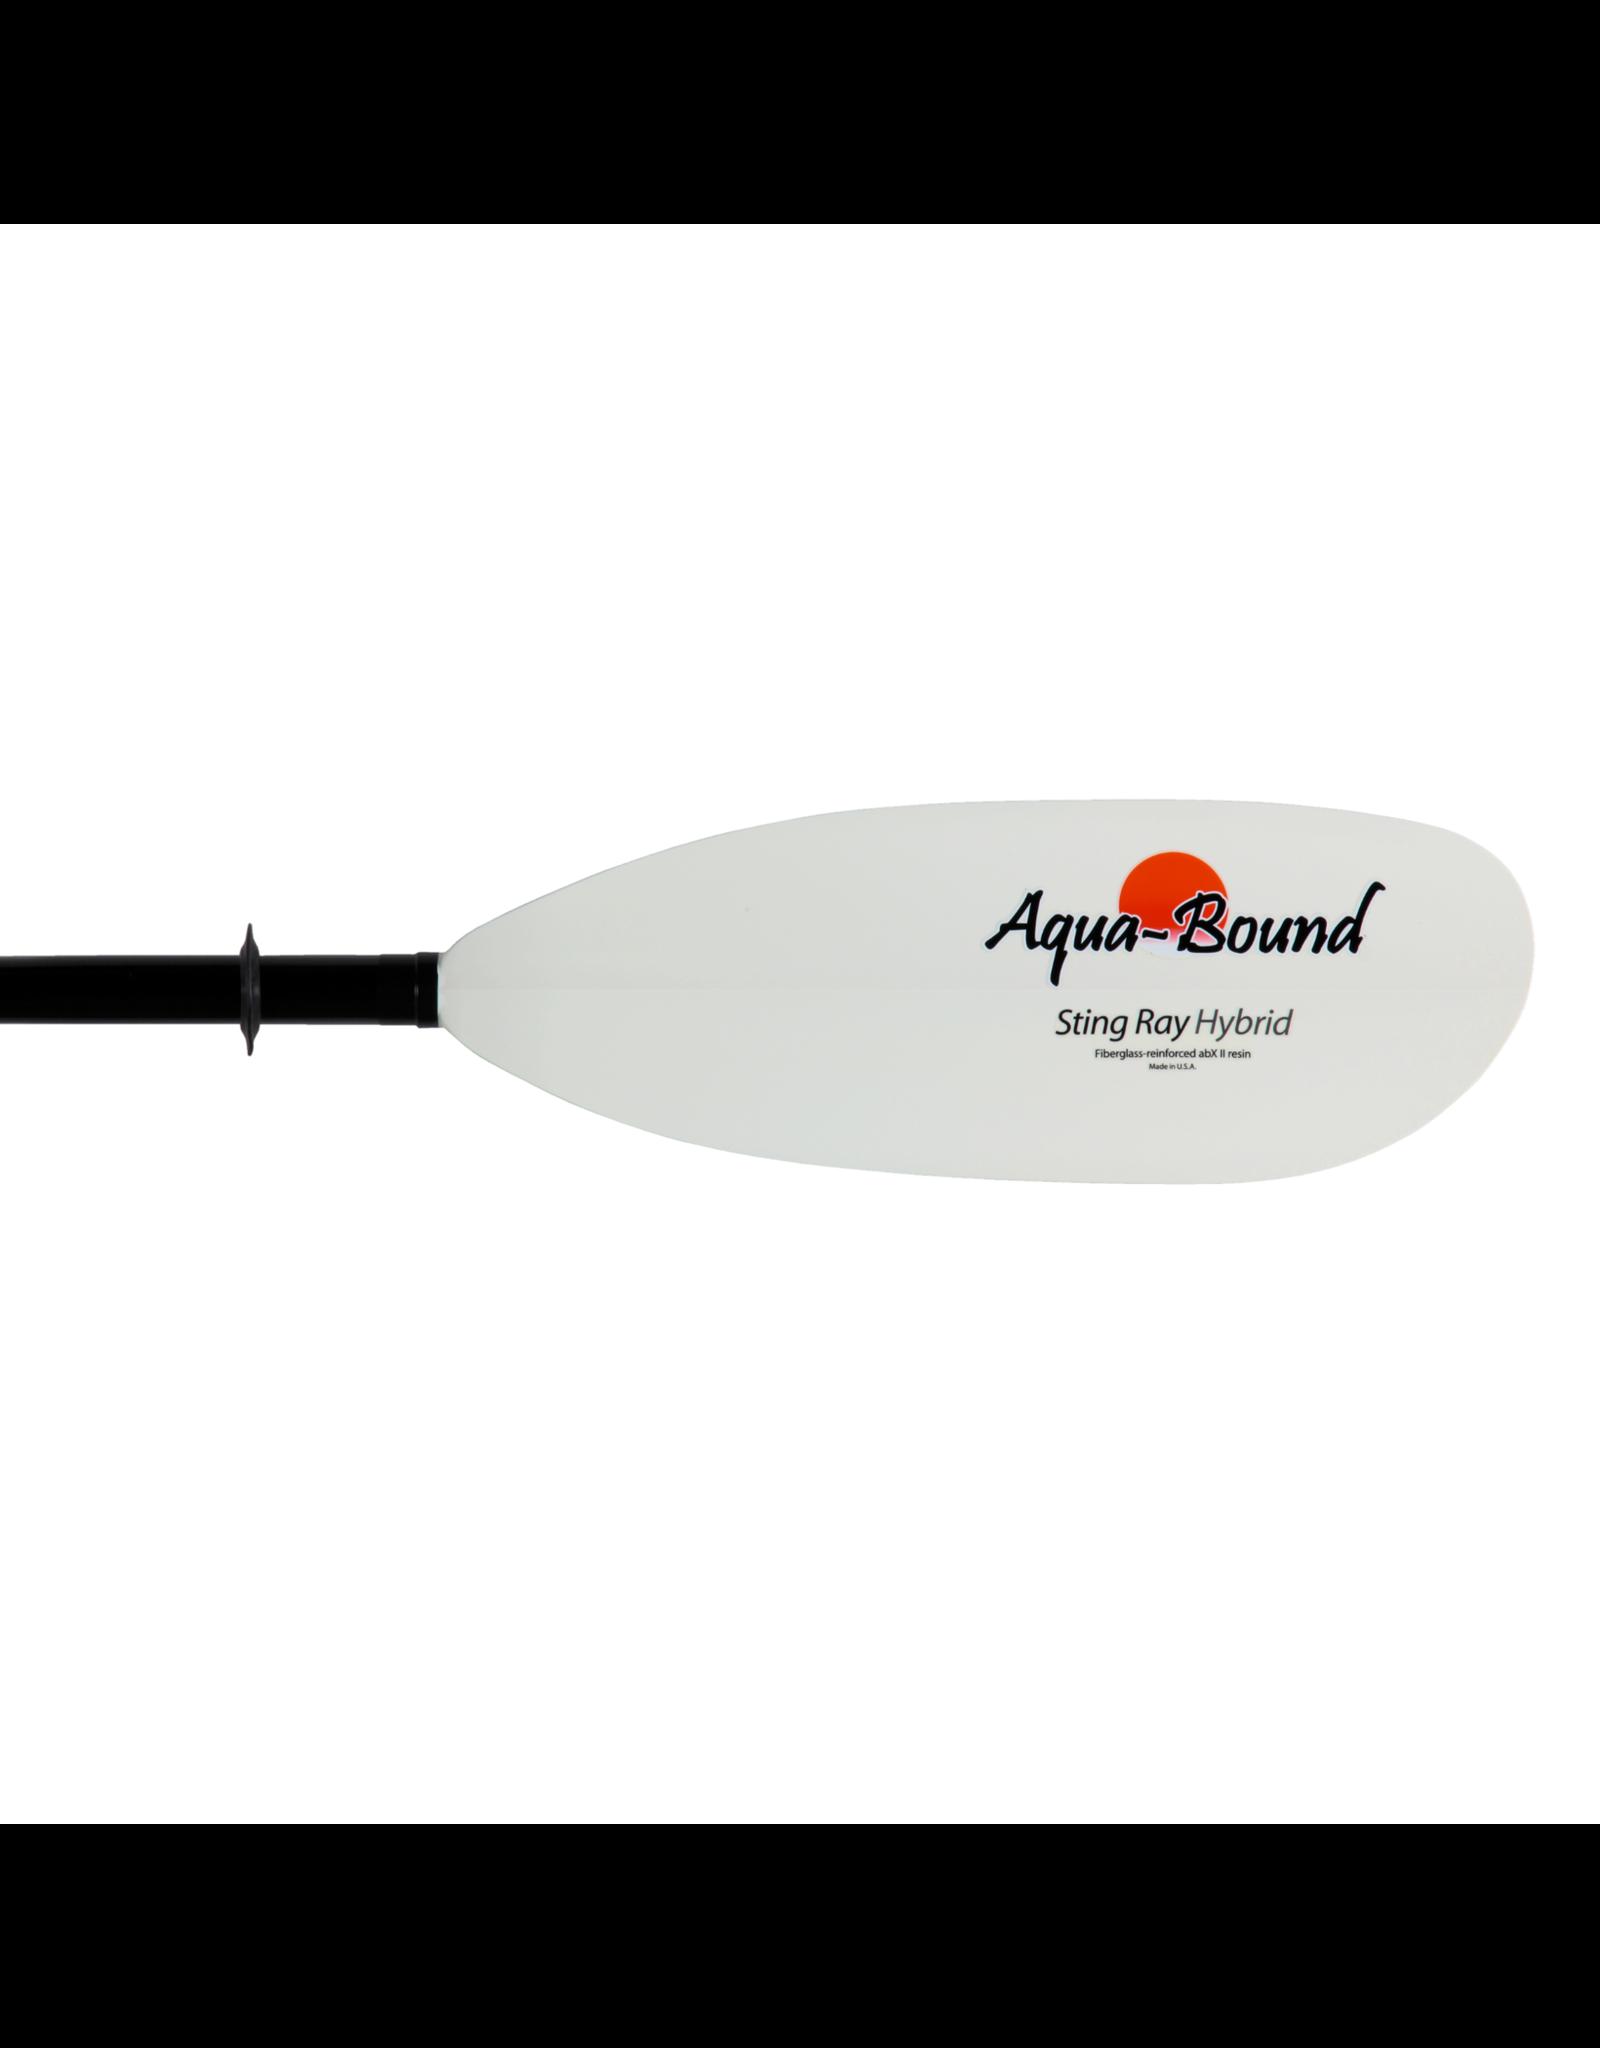 Aqua-Bound Aqua-Bound pagaie Sting Ray Hybrid Posi-lock